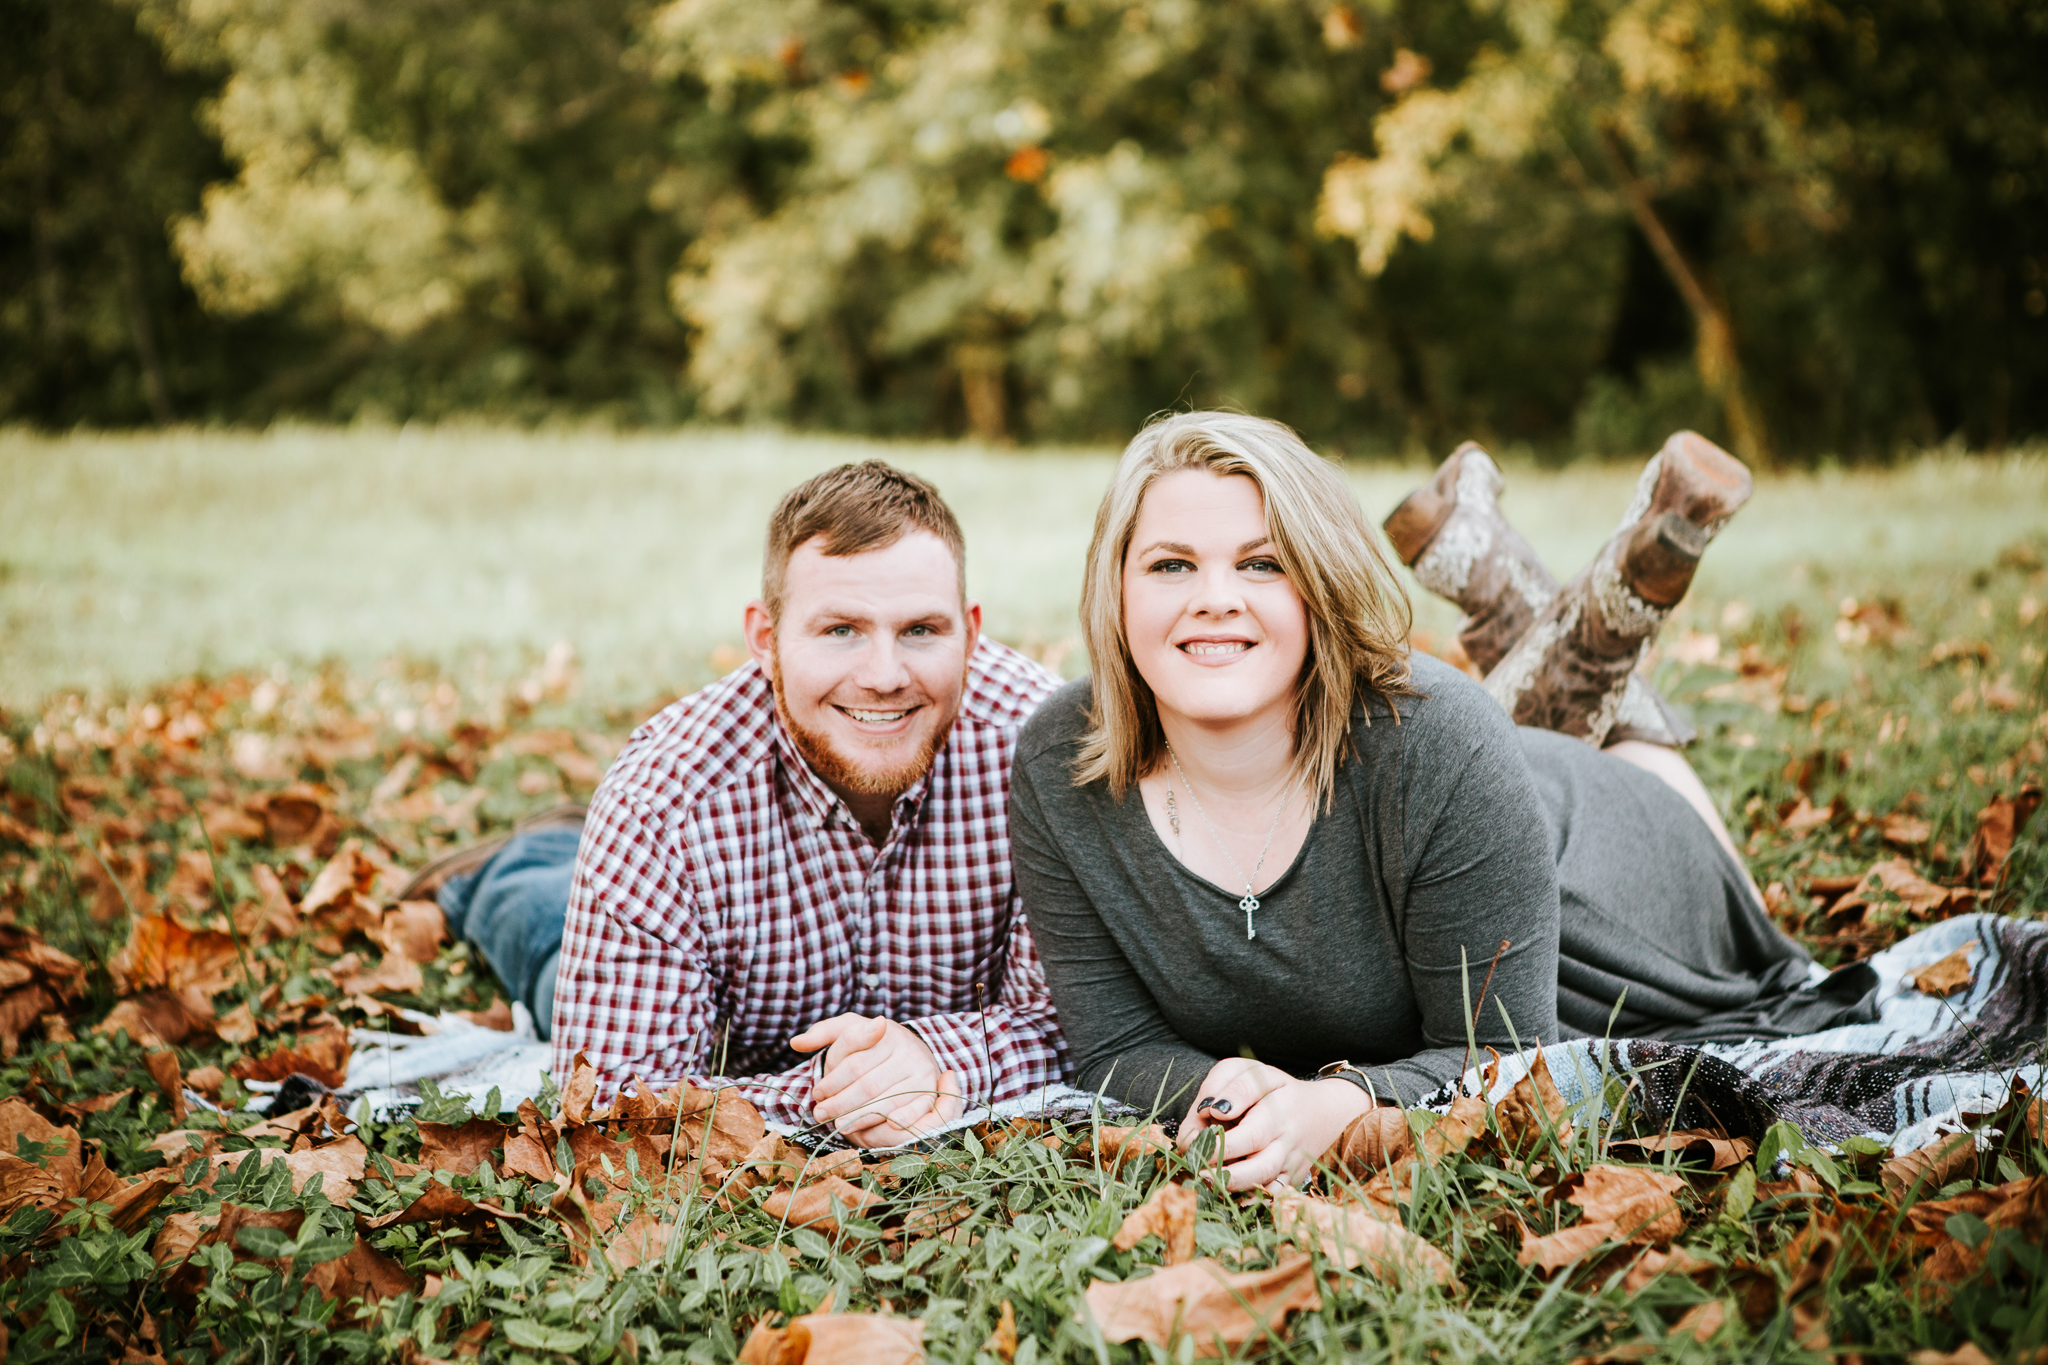 Richmond Kentucky Engagement Photographer - Ariana Jordan Photography -15.jpg